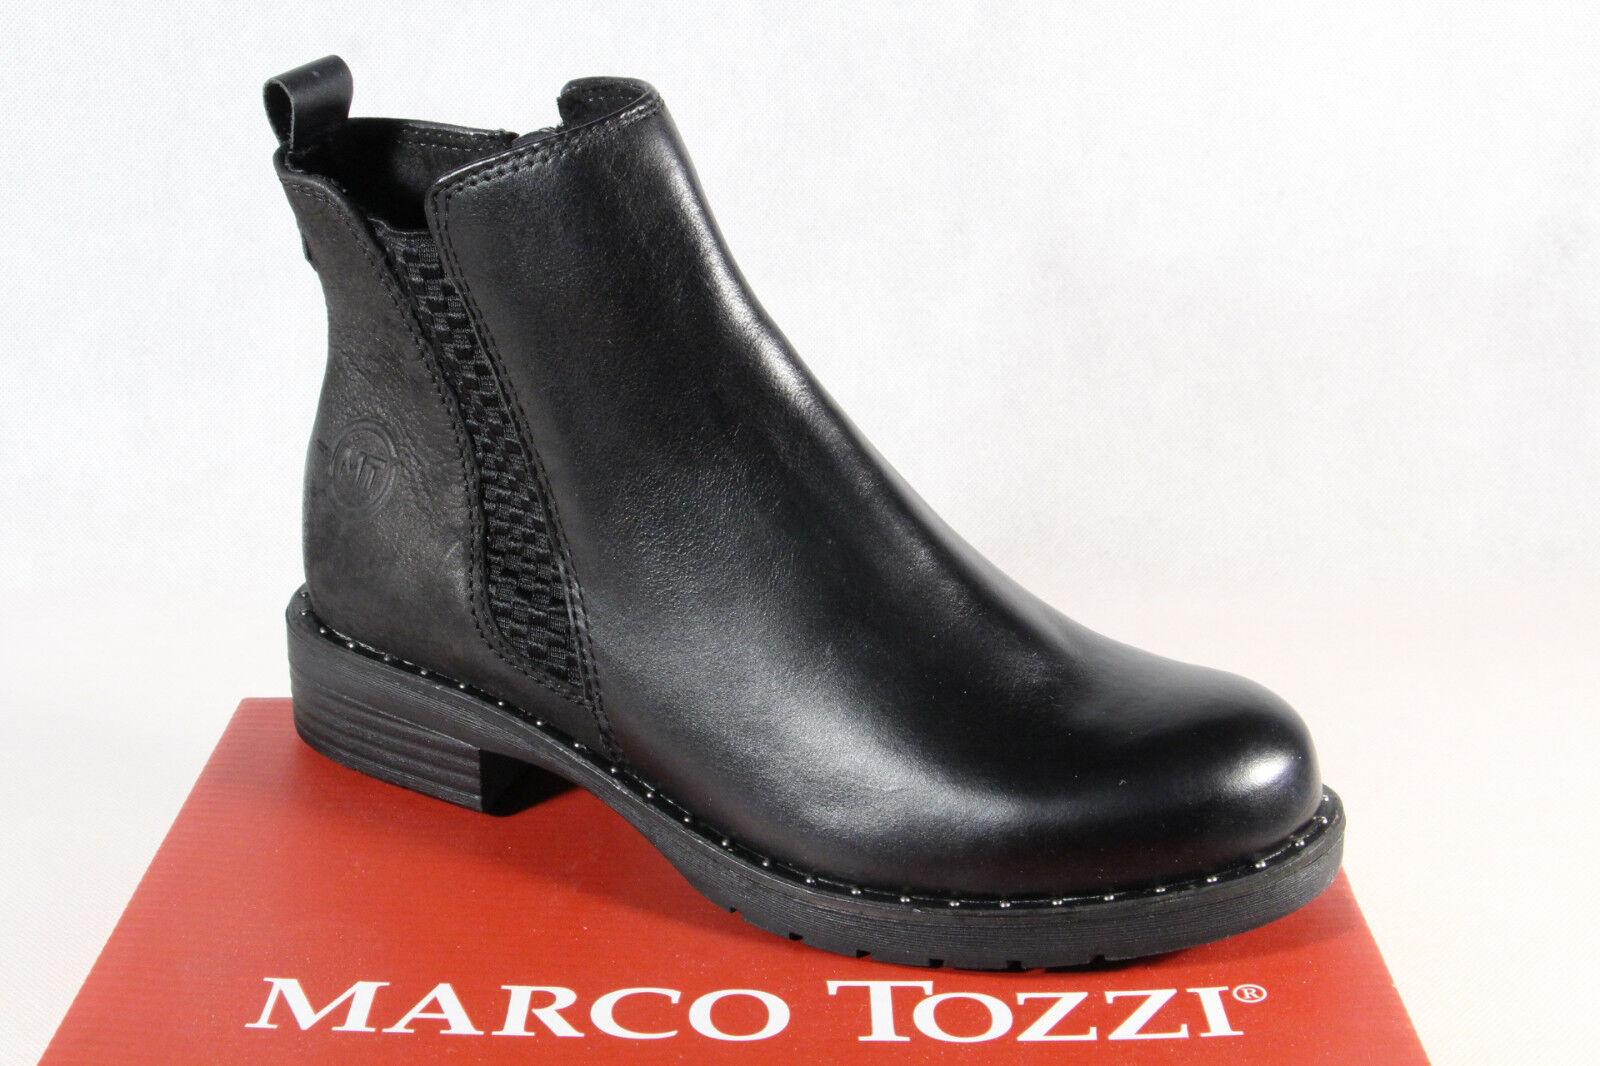 sports shoes 3c5ba 34767 Marco Tozzi Damen Stiefelette Stiefel Winterstiefel Boots schwarz 25437  NEU!!